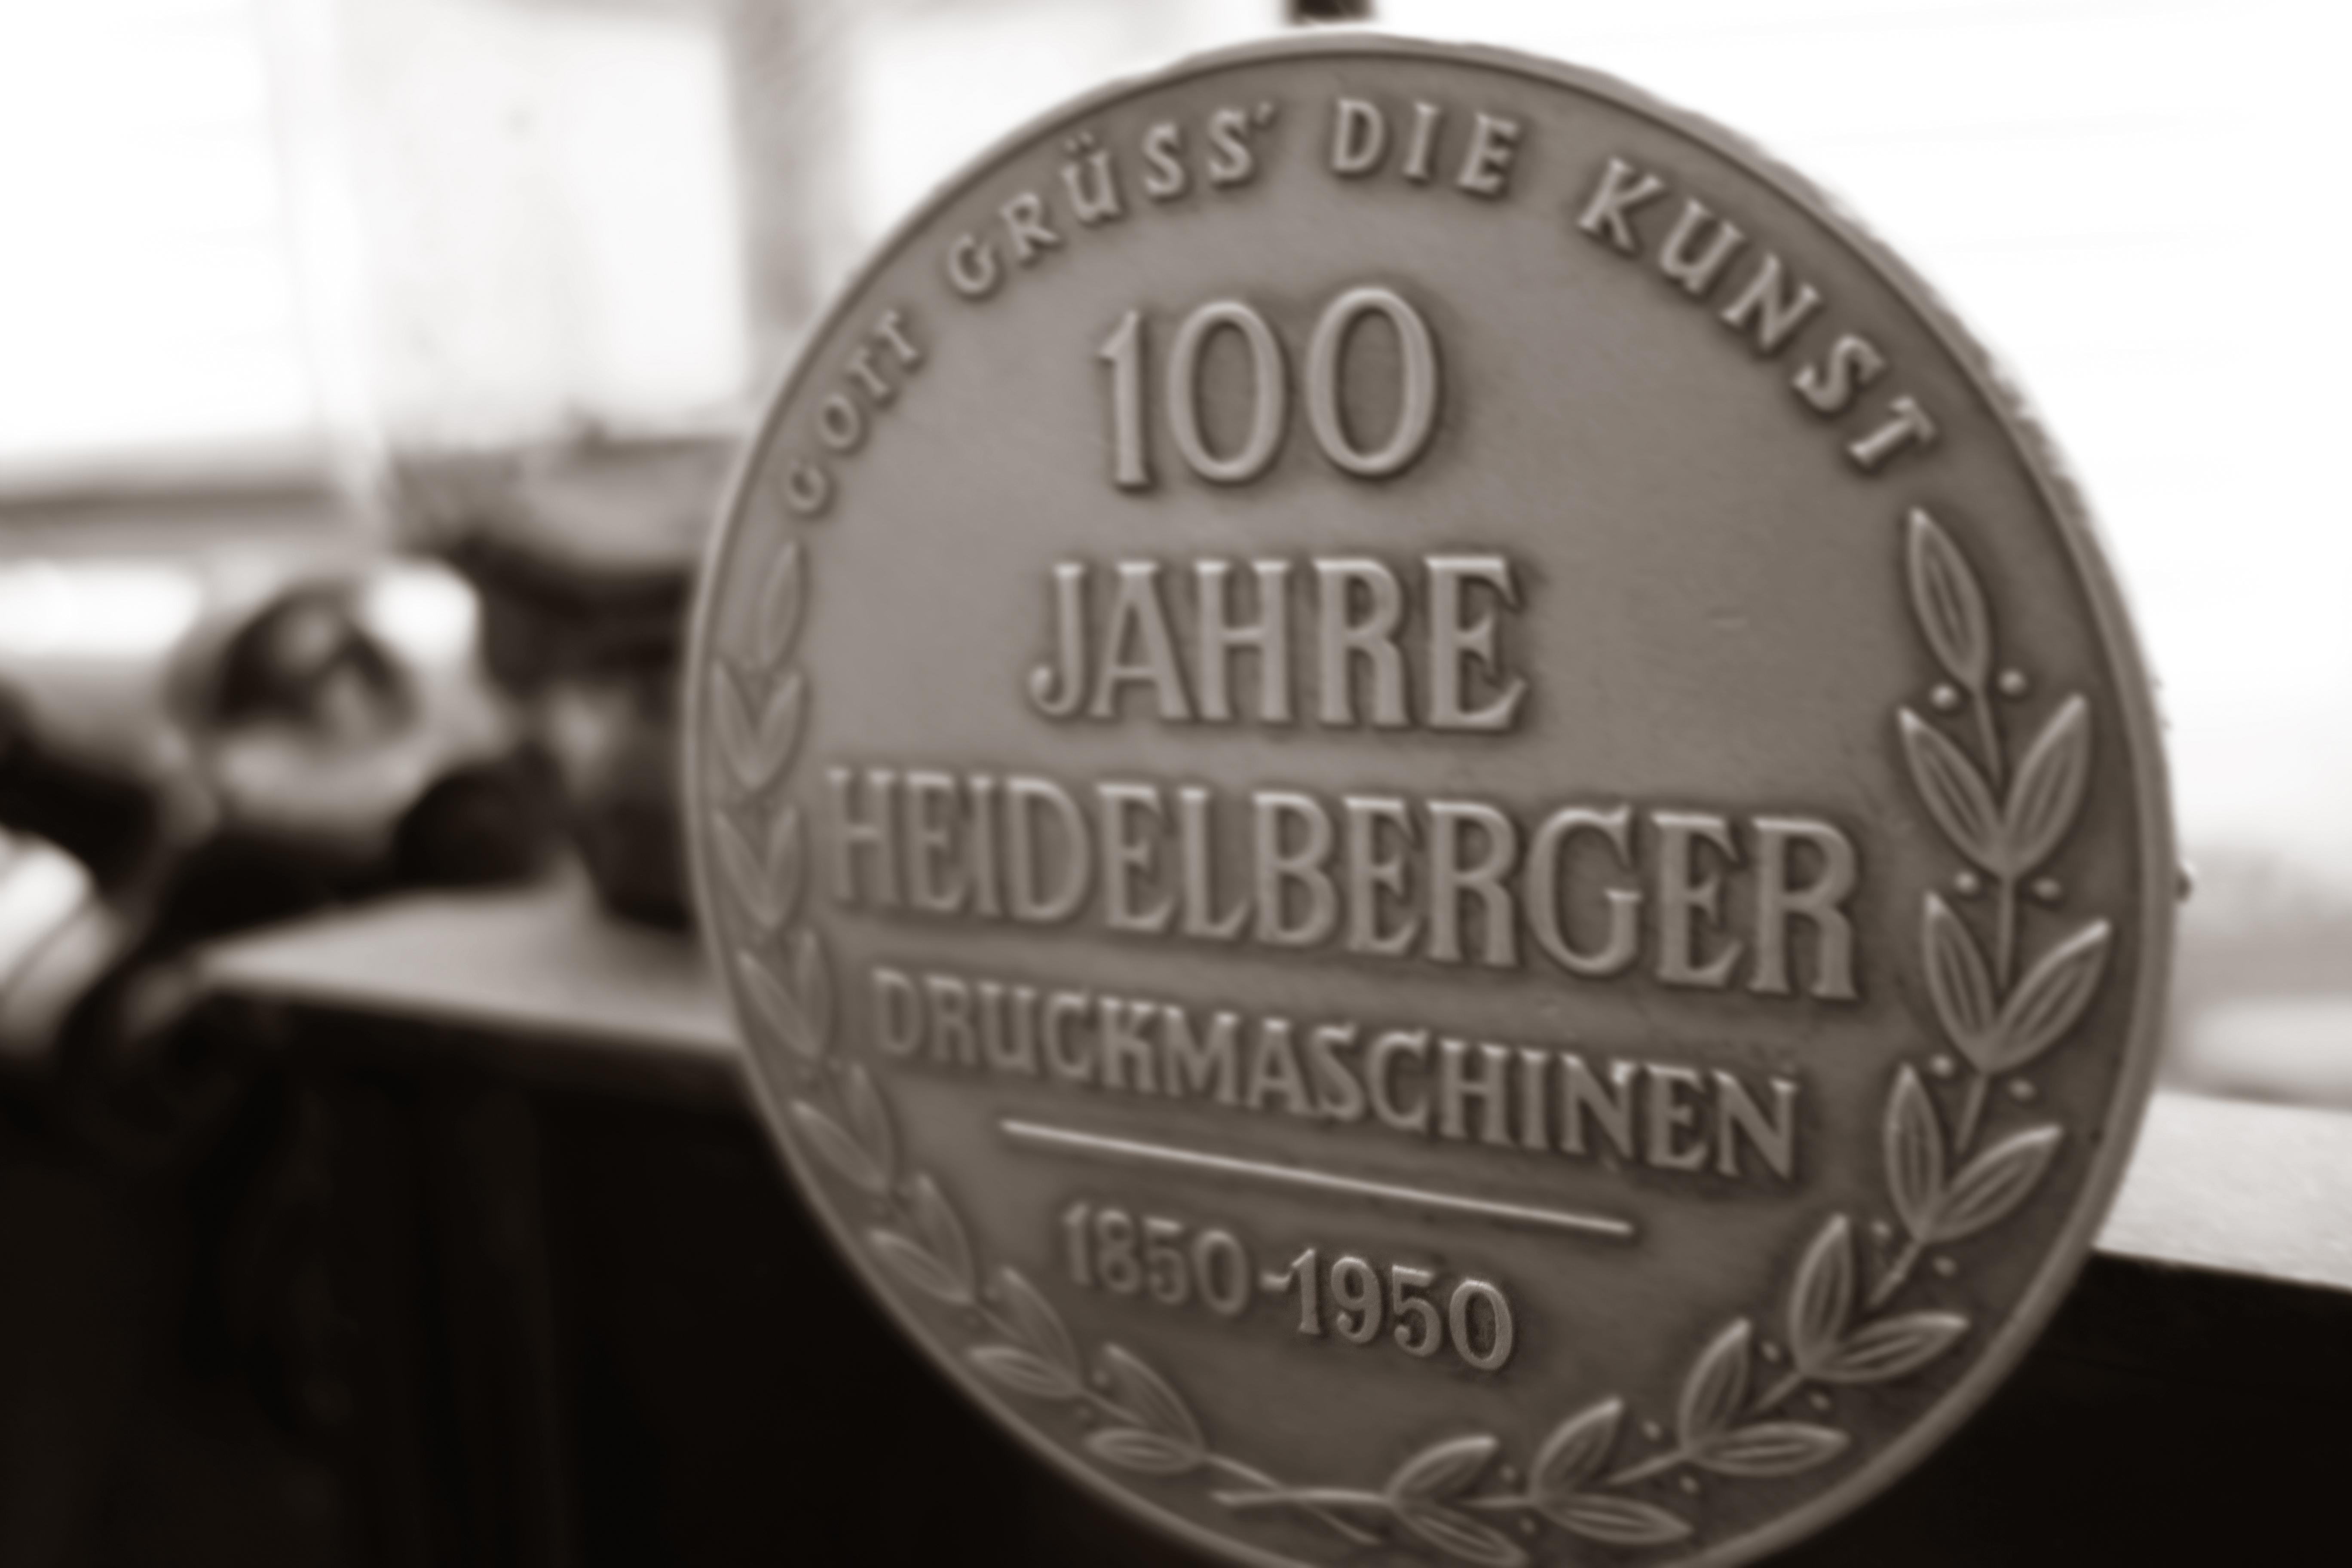 100 Jahre Heidelberg